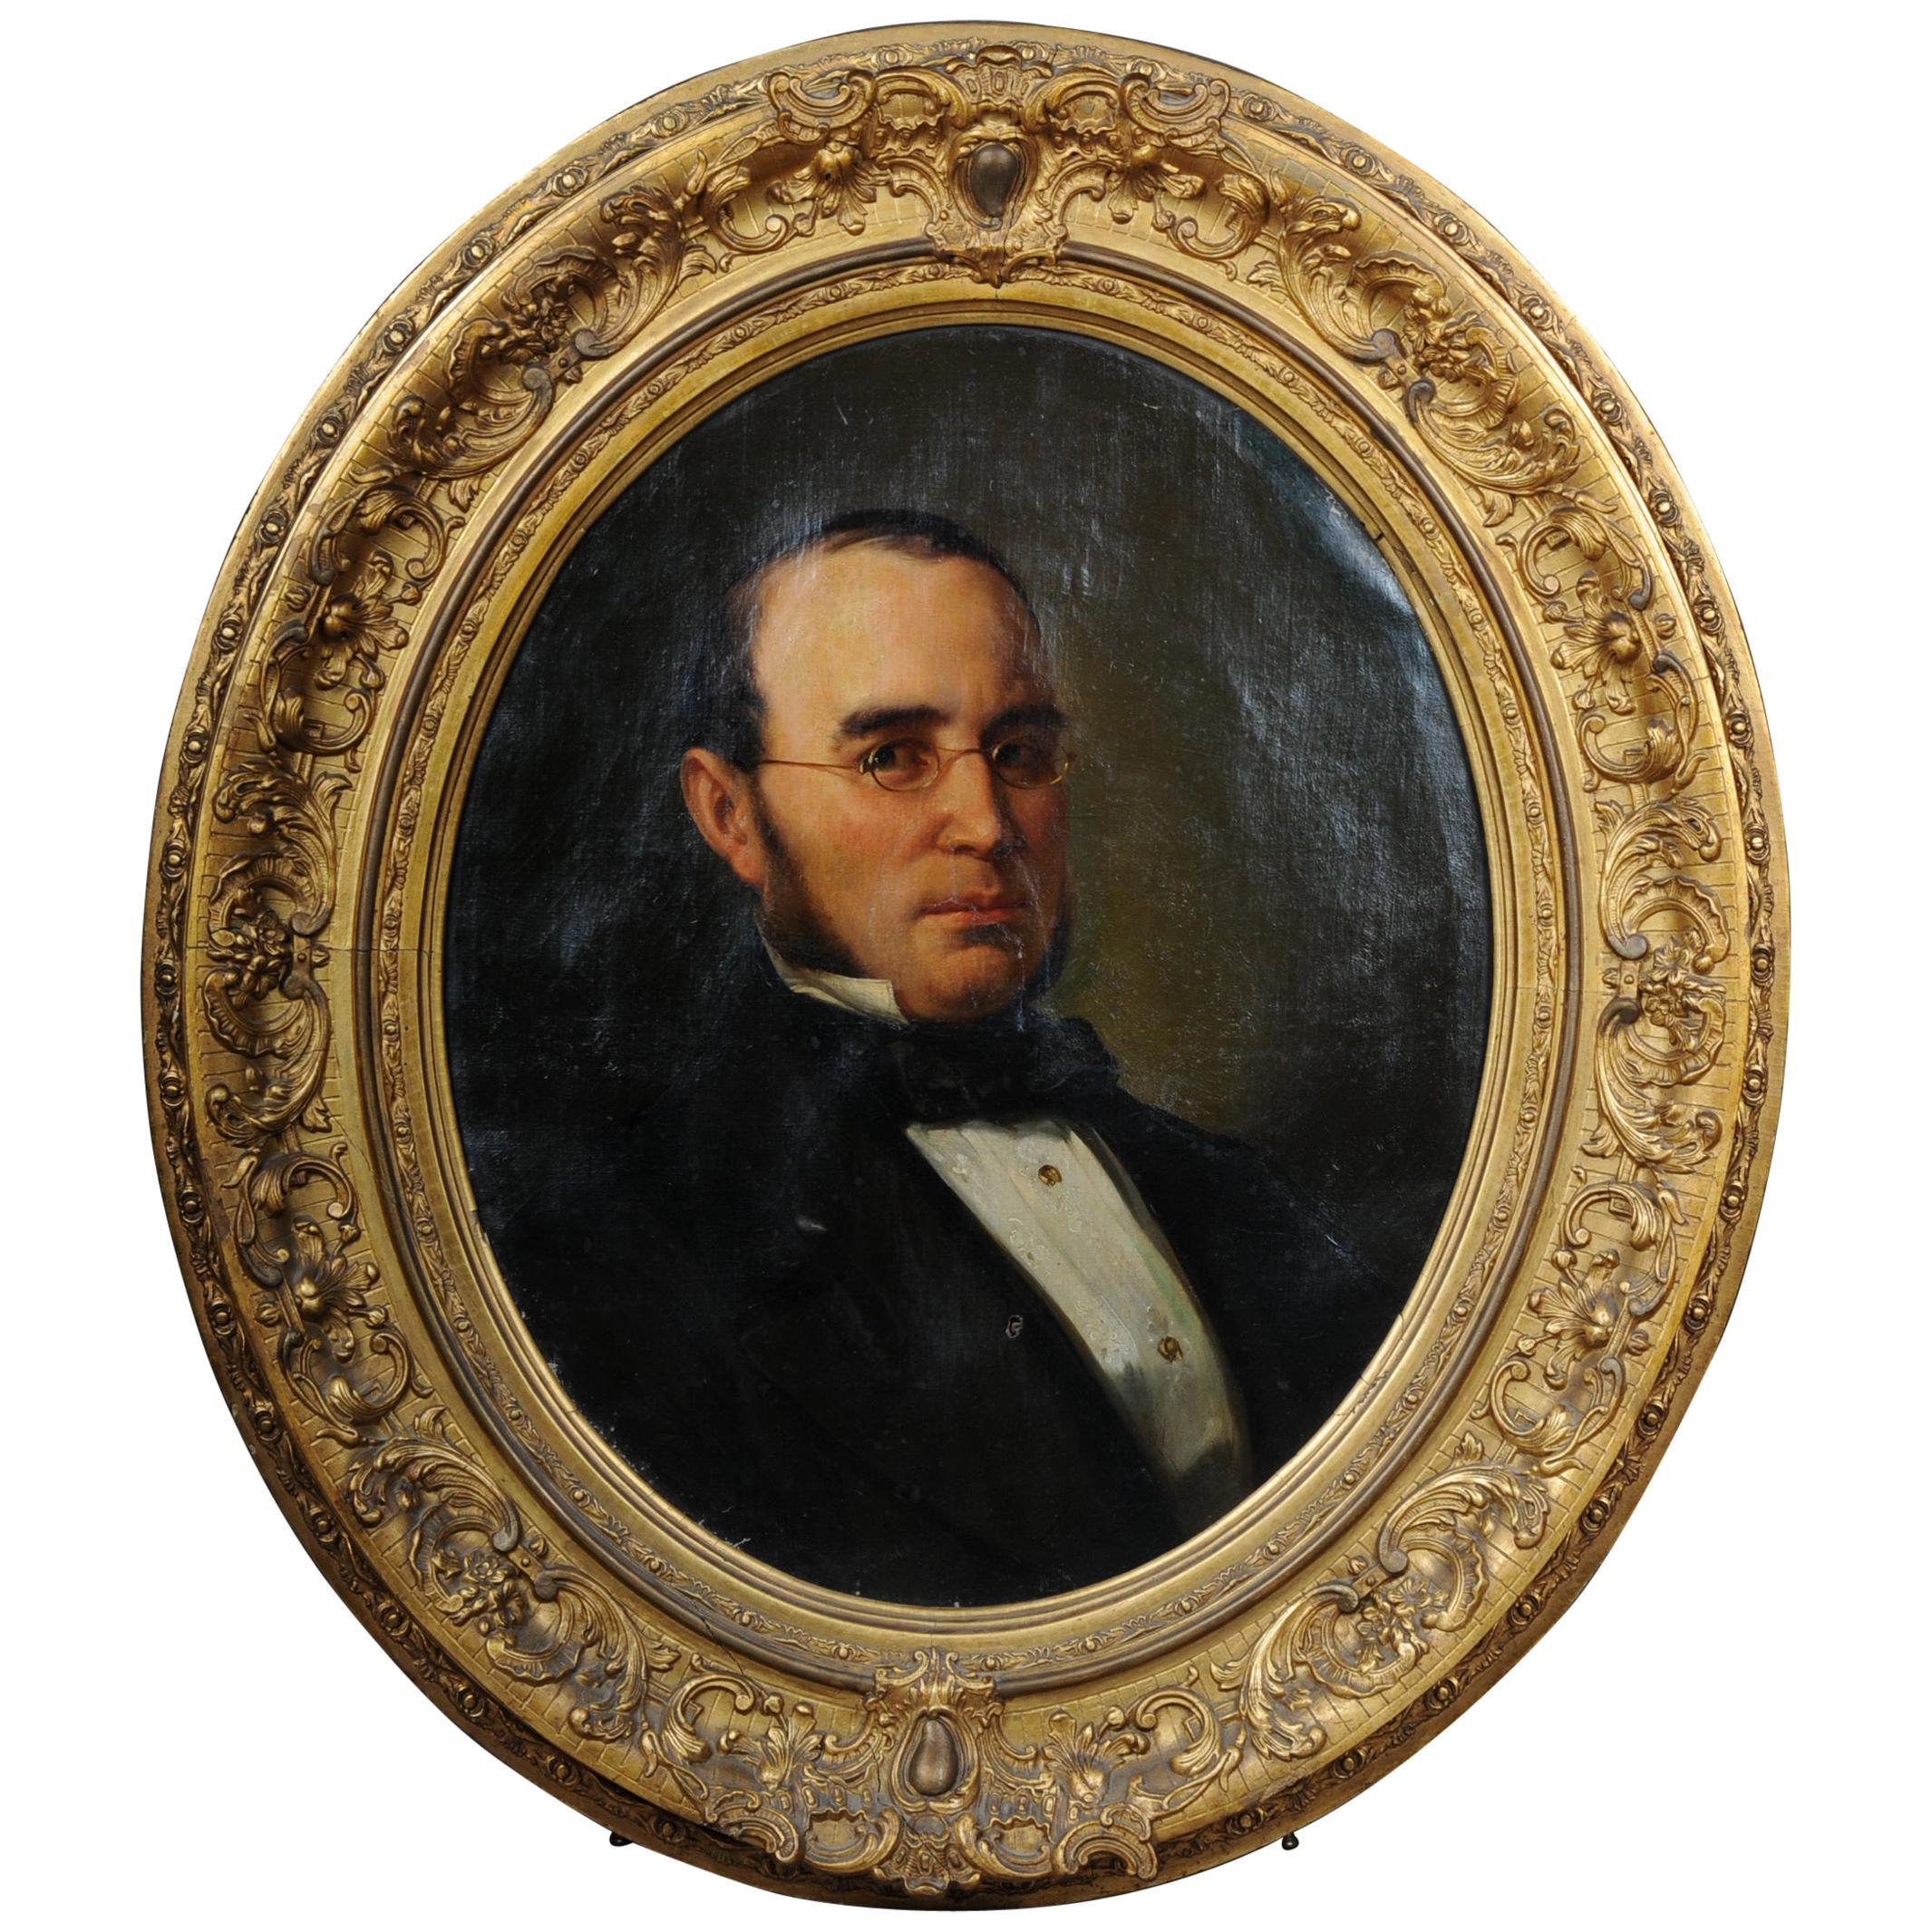 Antique Oval Biedermeier Gentlemen's Portrait / Painting, 19th Century